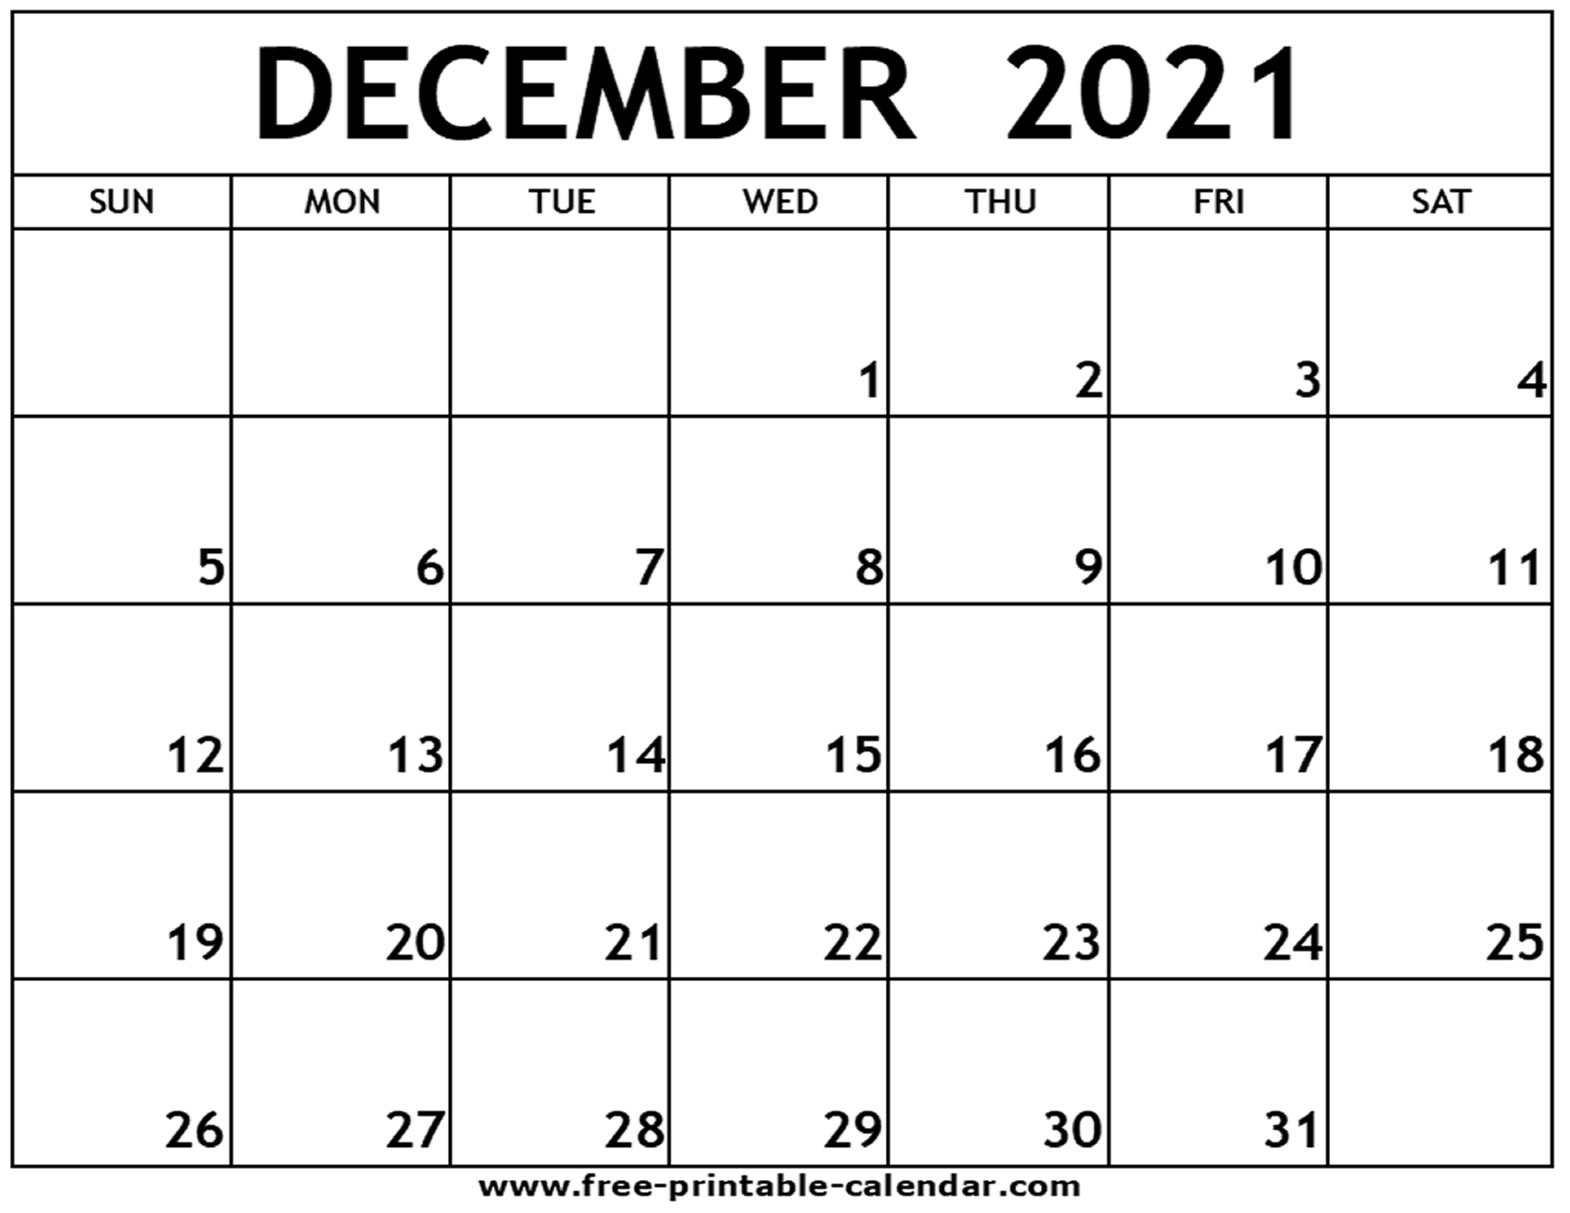 Get December Calendar Page 2021